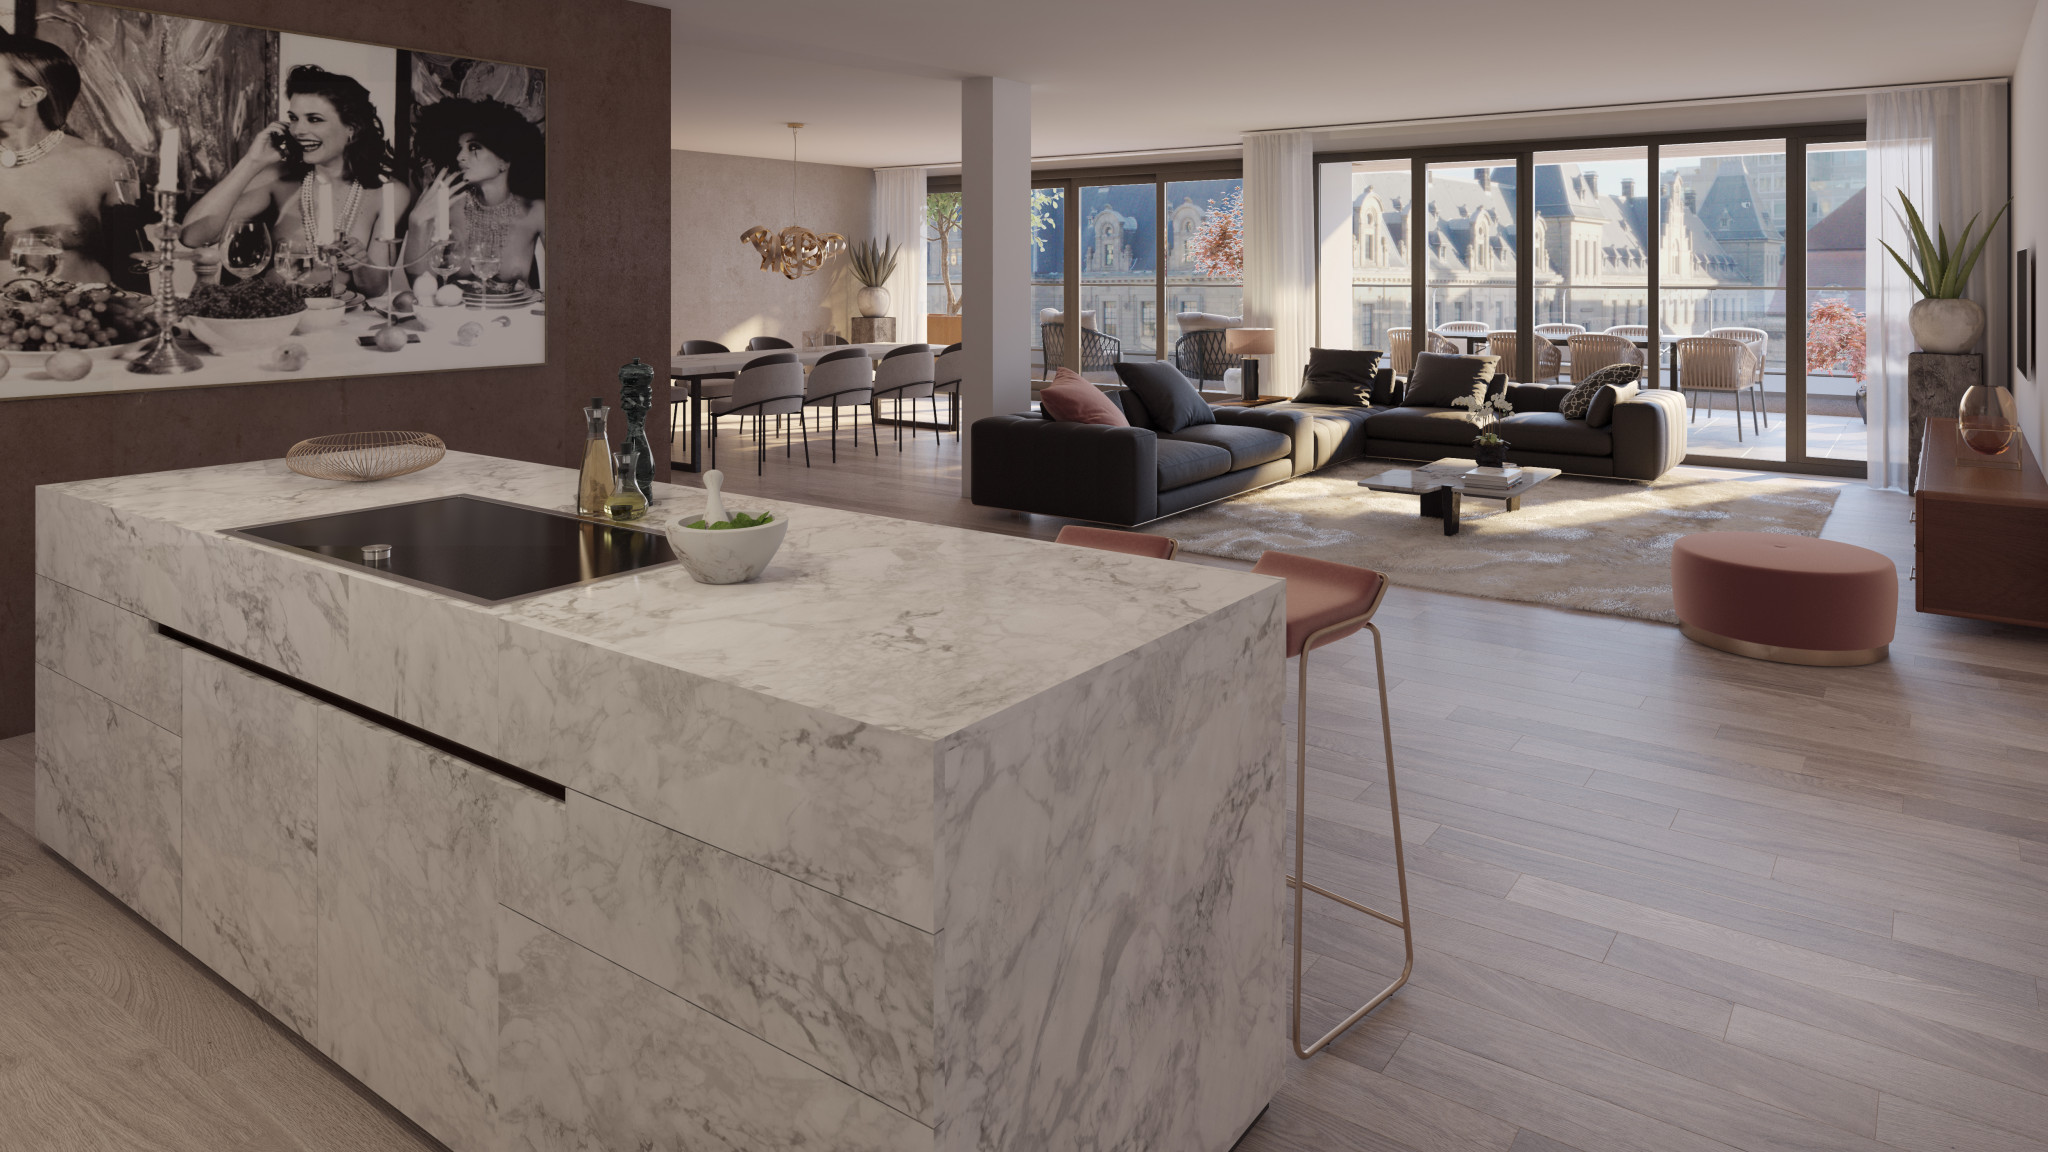 Nº 75 Coolsingel wonen nieuwbouw centrum Rotterdam